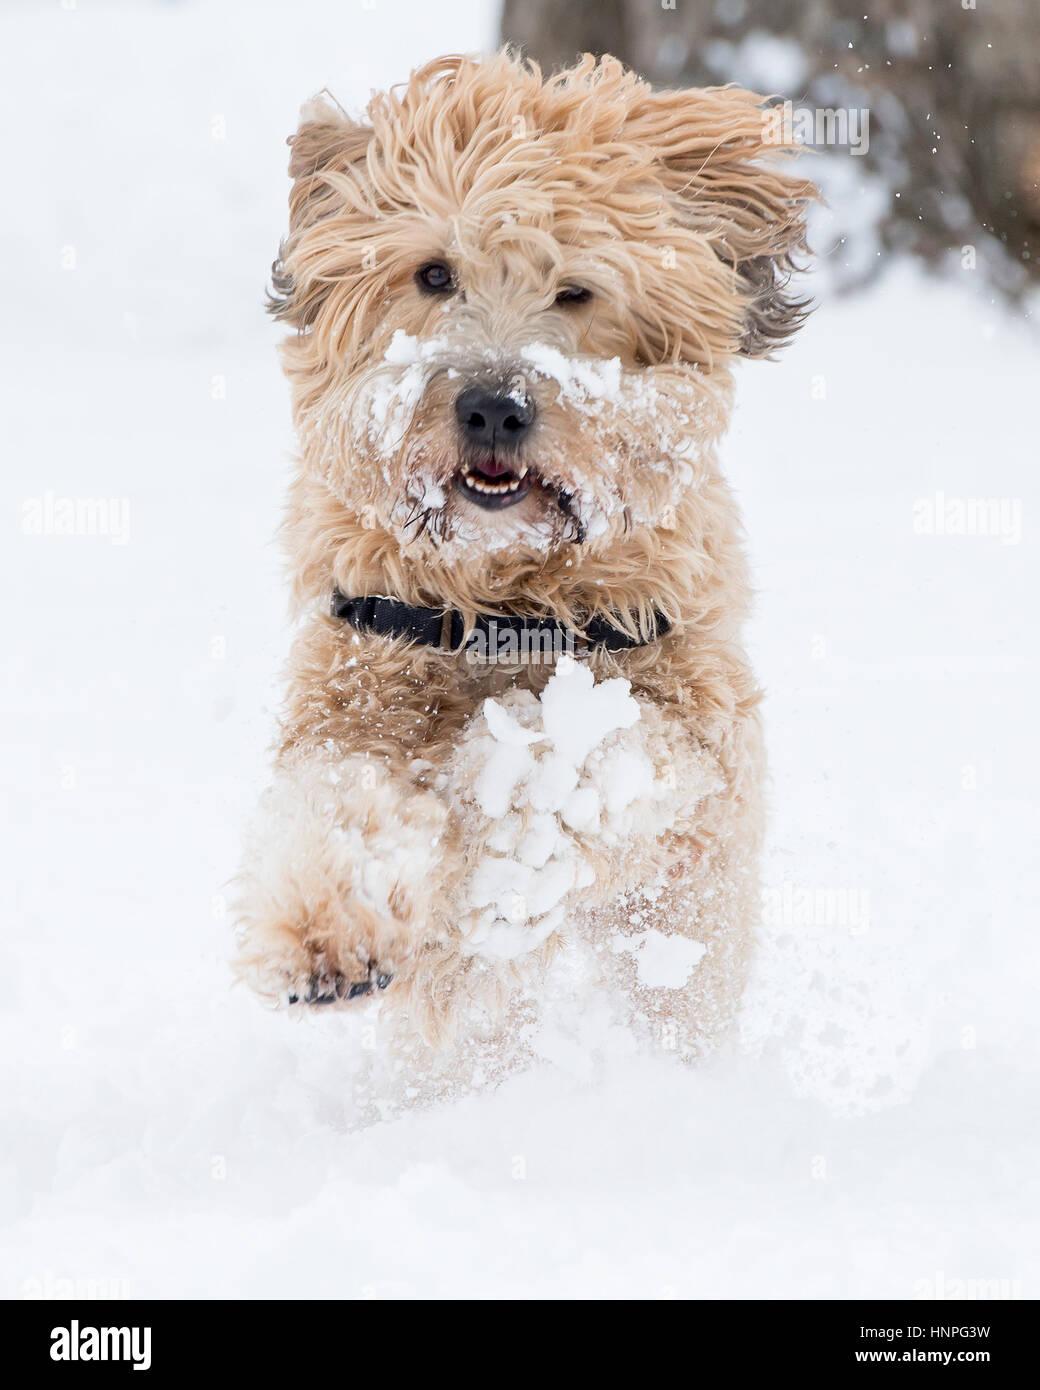 Wheaten Terrier Stock Photos & Wheaten Terrier Stock Images - Page 2 ...